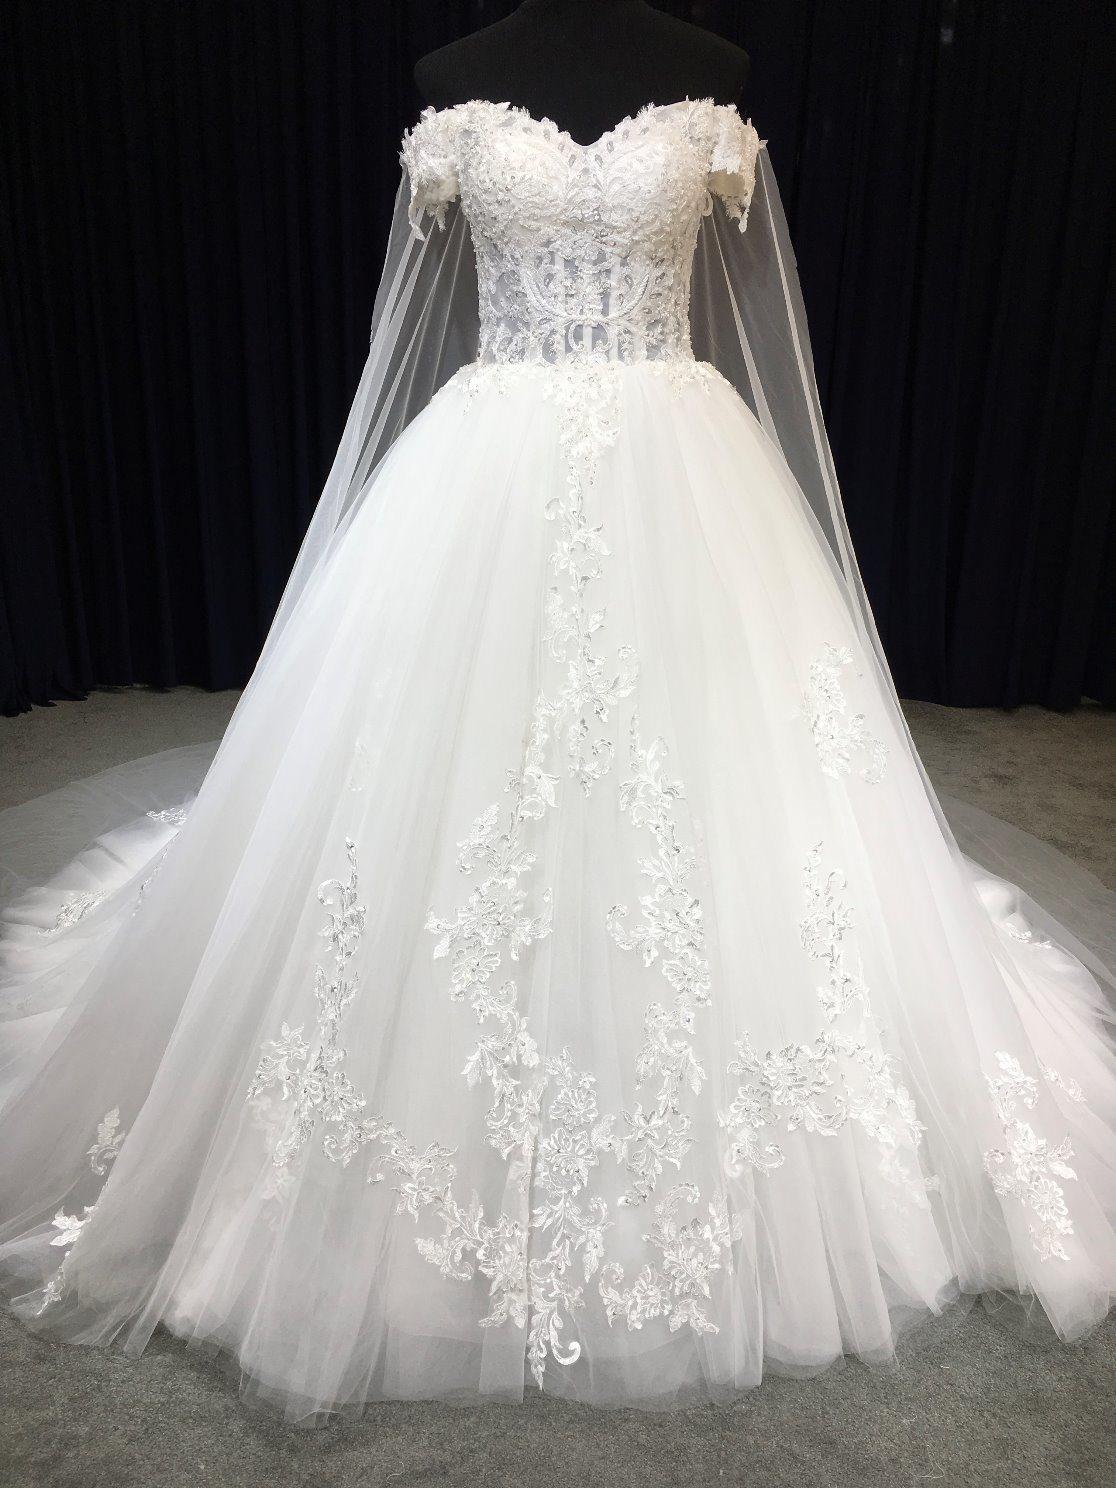 [hot item] aoliweiya best selling design sweetheart wedding gown